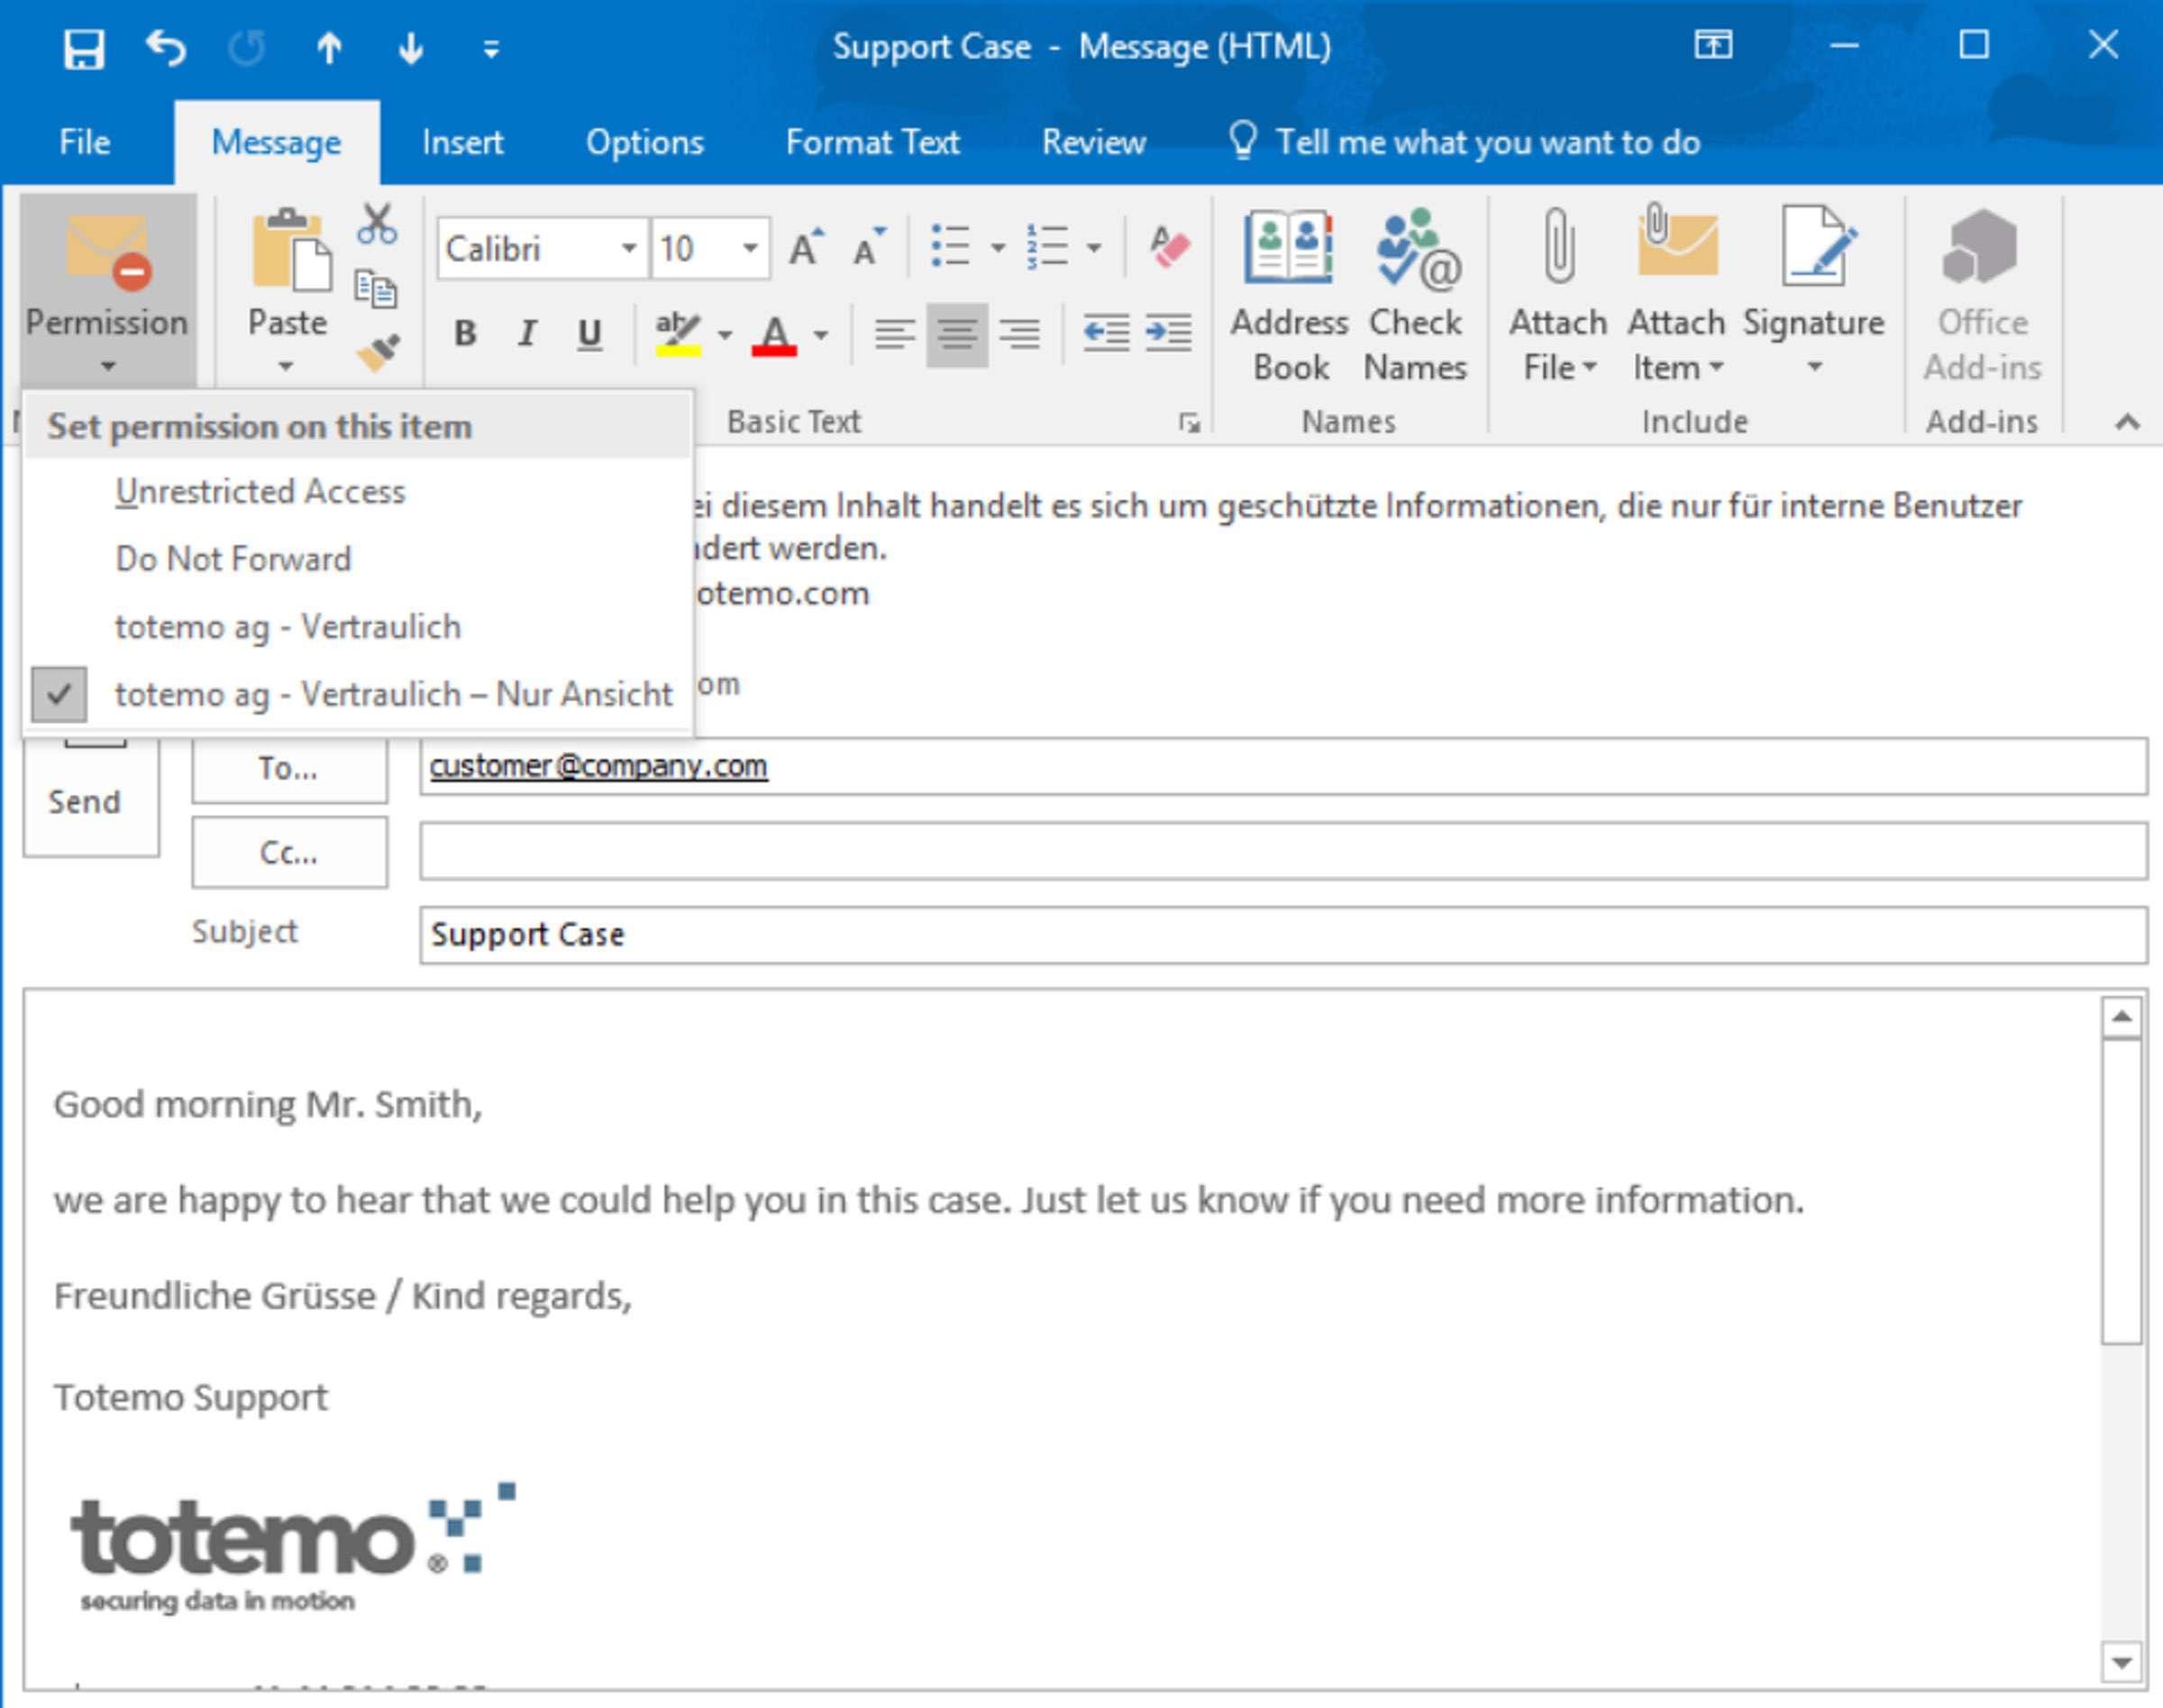 totemo integriert Microsoft Azure Information Protection in E-Mail-Verschlüsselungslösung